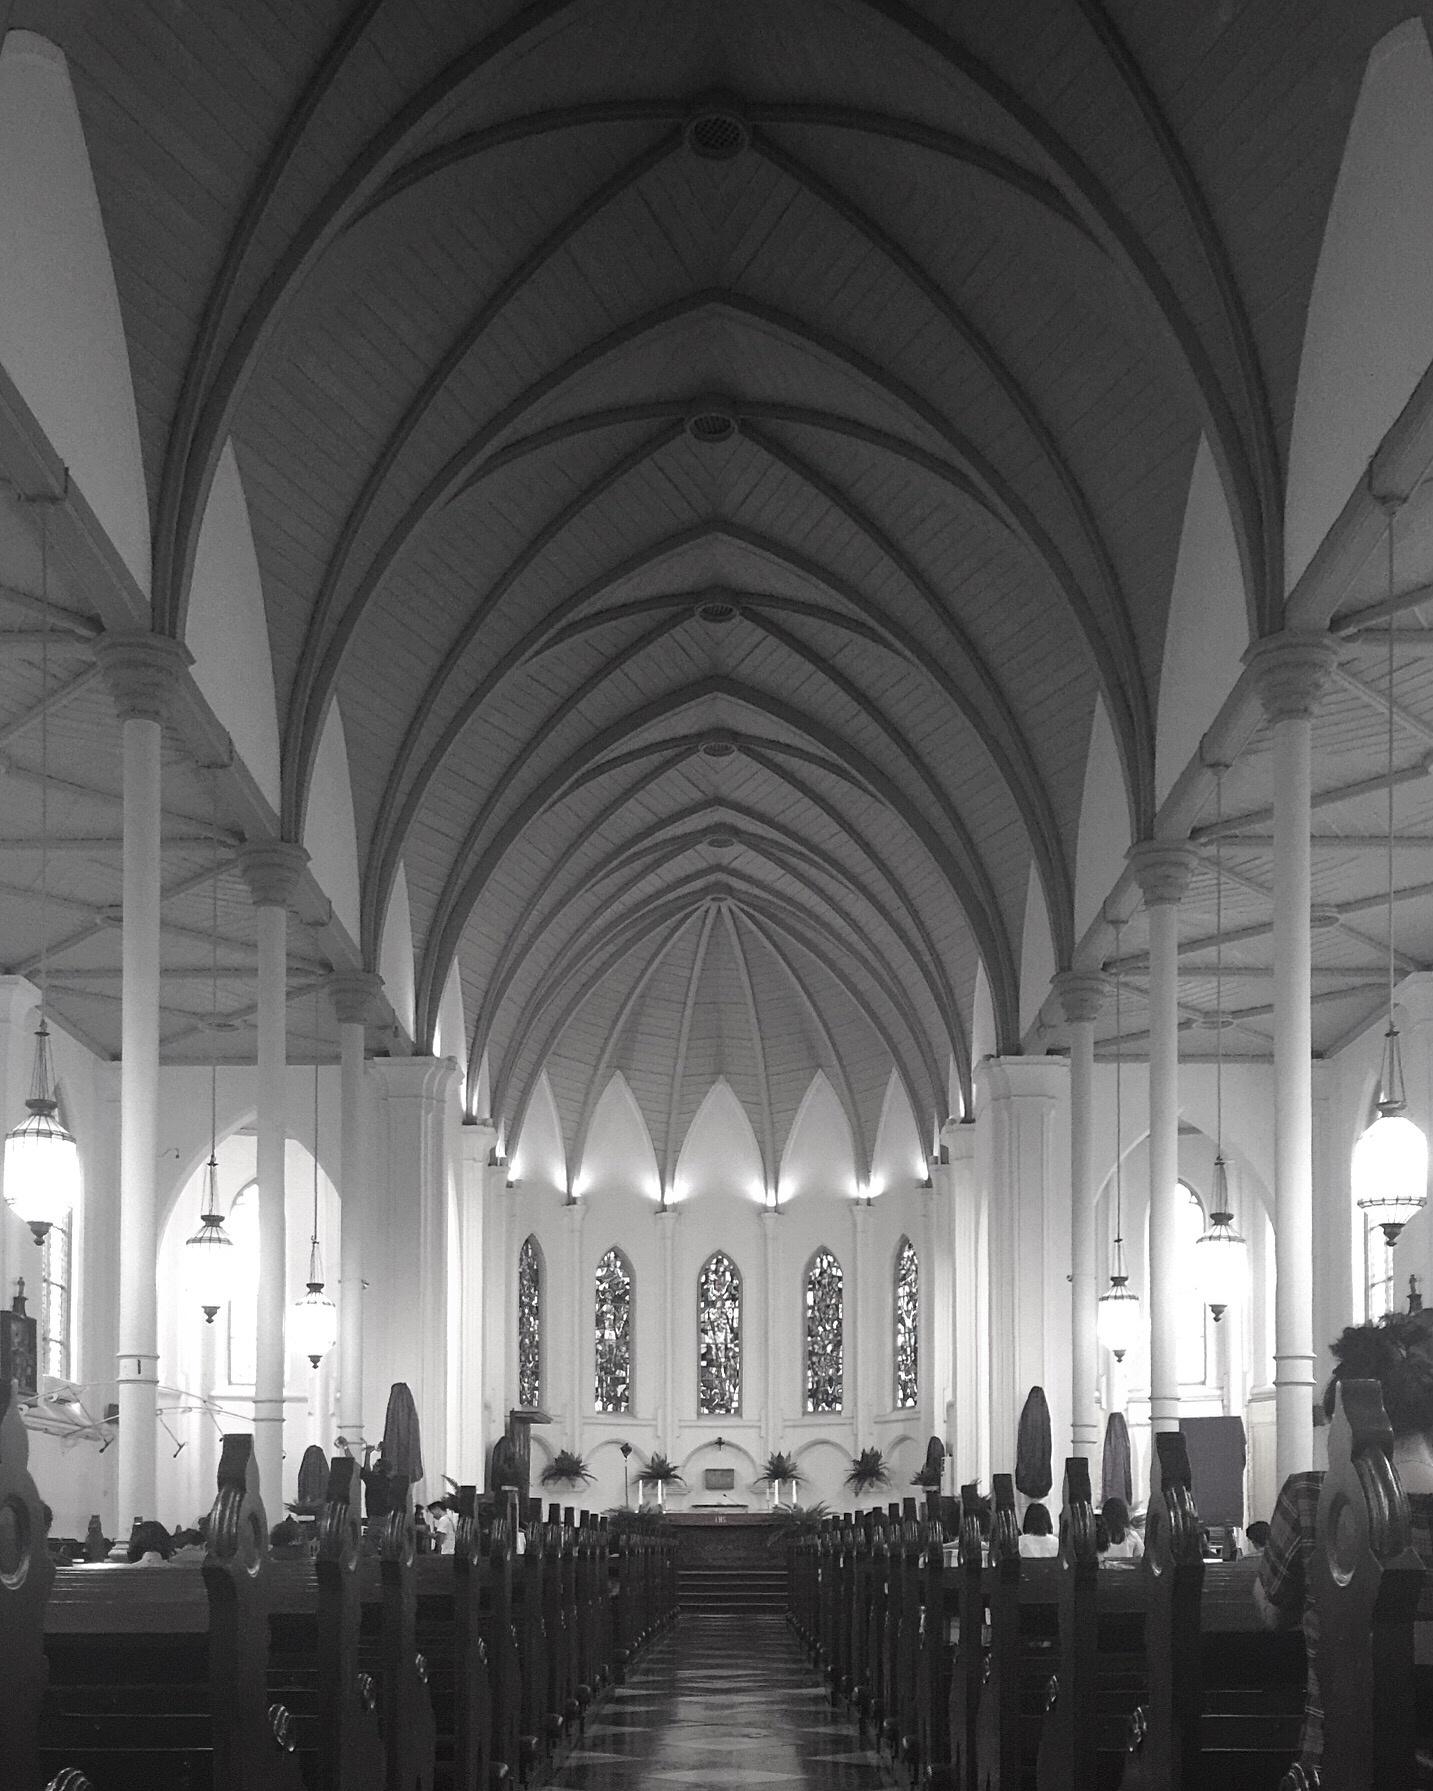 BMV Cathedral, Bogor - Indonesia by Danny Rustandi